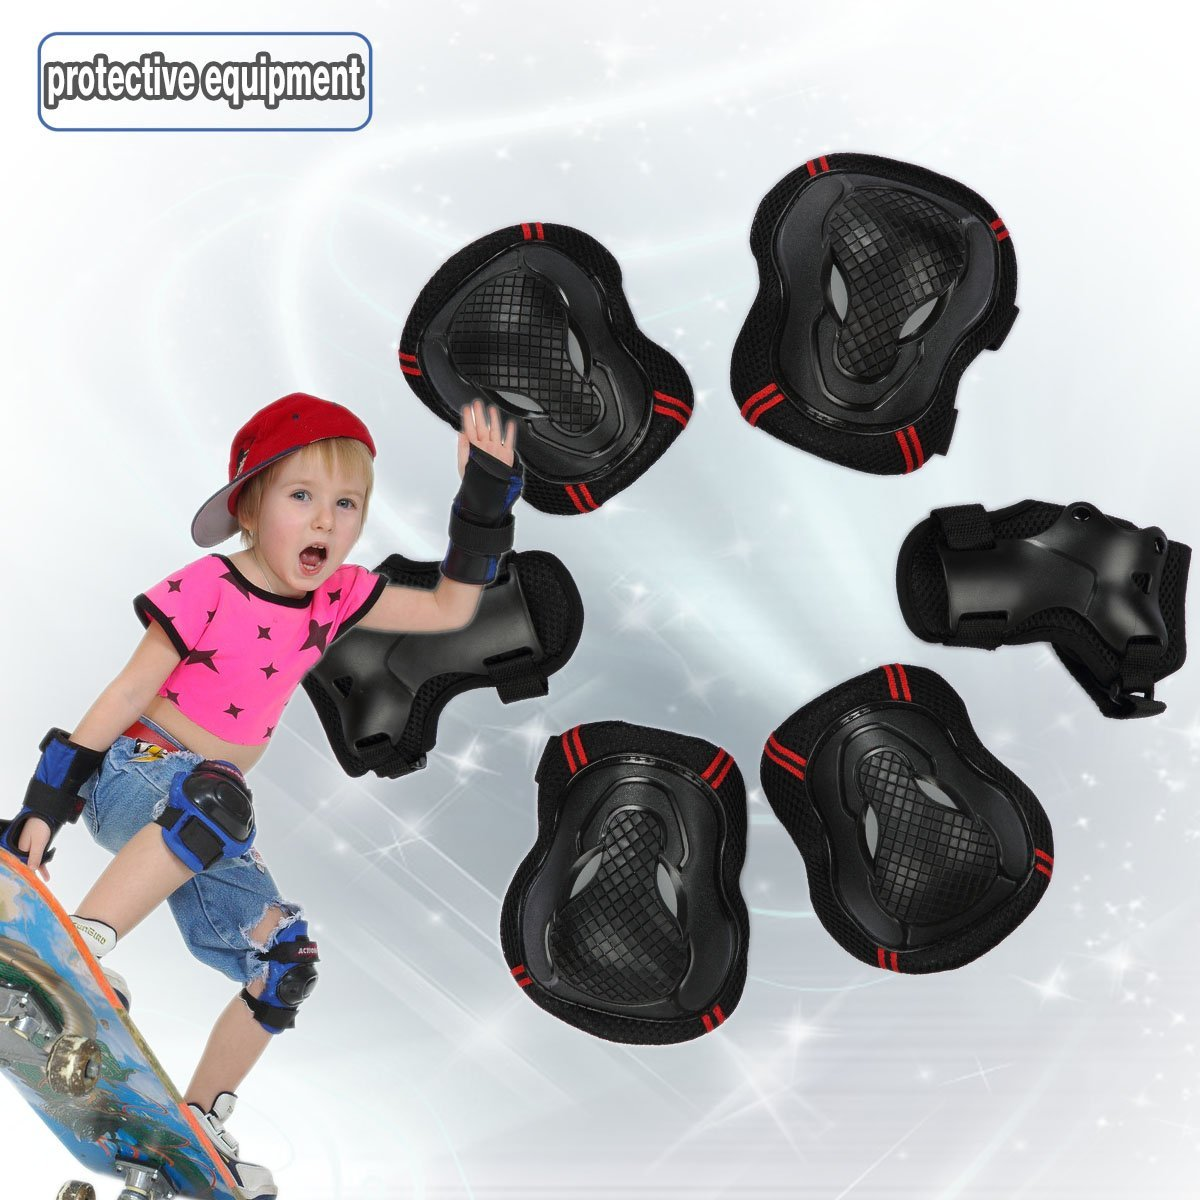 Bestmall Knee Elbow Wrist Protective Pads Sets,CoastaCloud 6pcs Protector Guard Pad